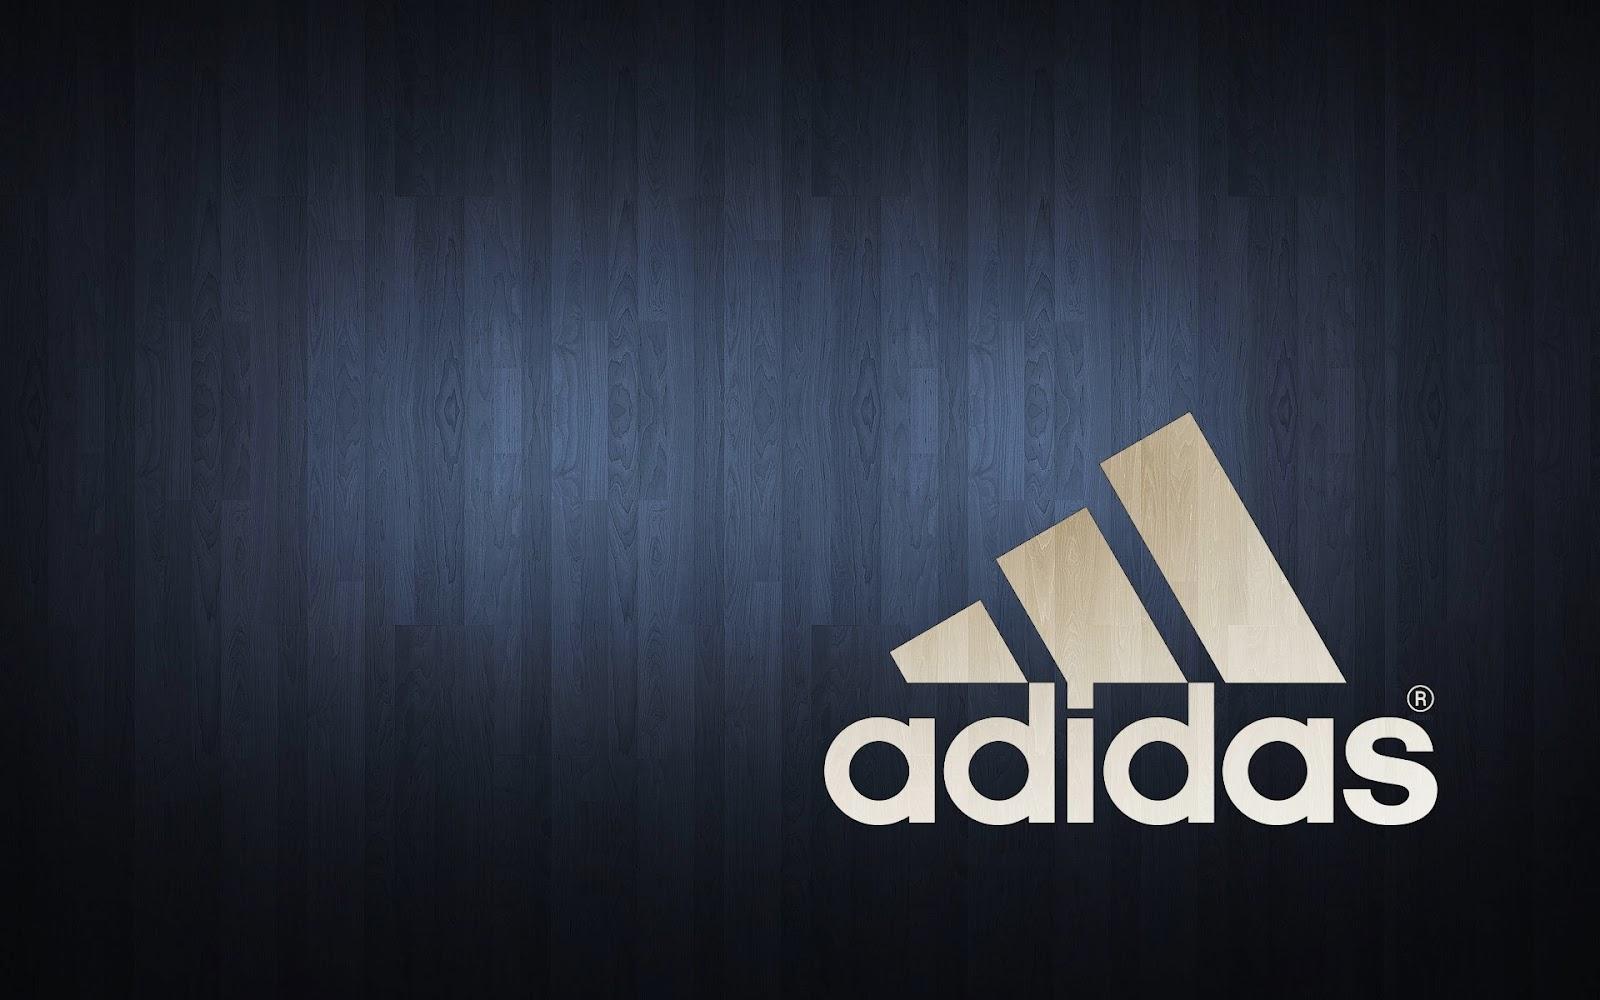 adidas wallpaper hd 1080p